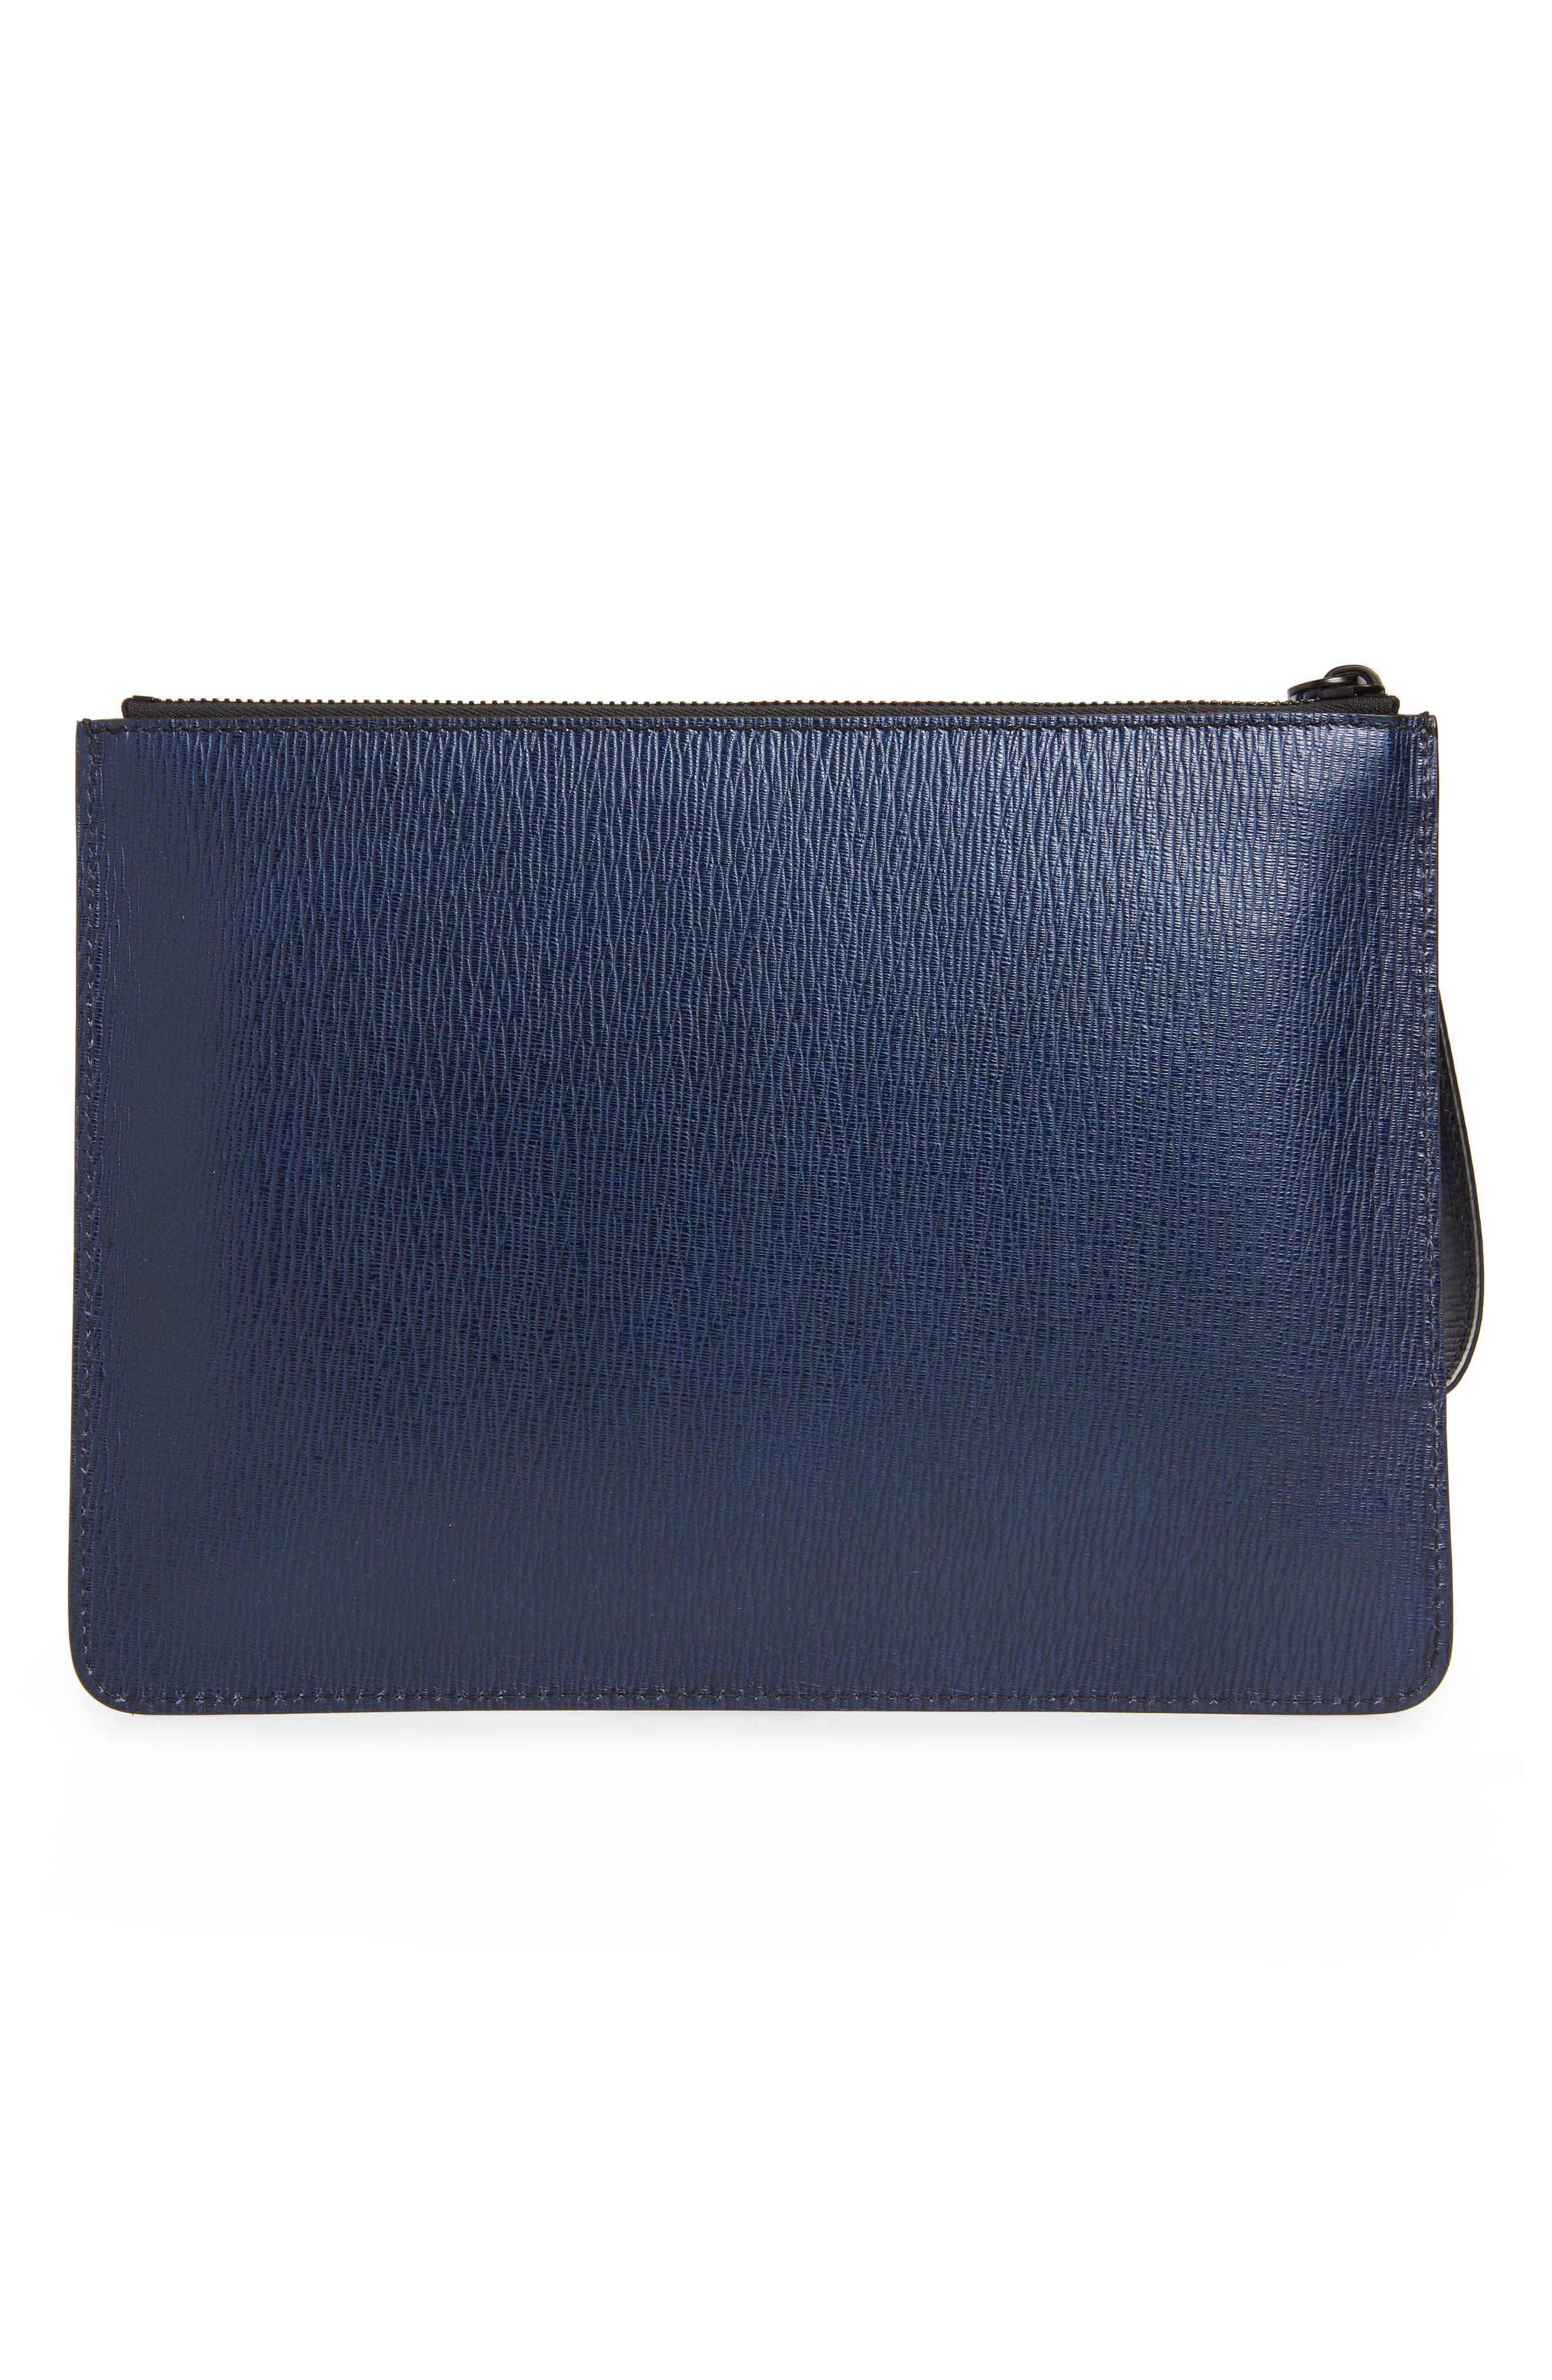 SALVATORE FERRAGAMO, Textured Leather Zip Pouch, Alternate thumbnail 2, color, NAVY